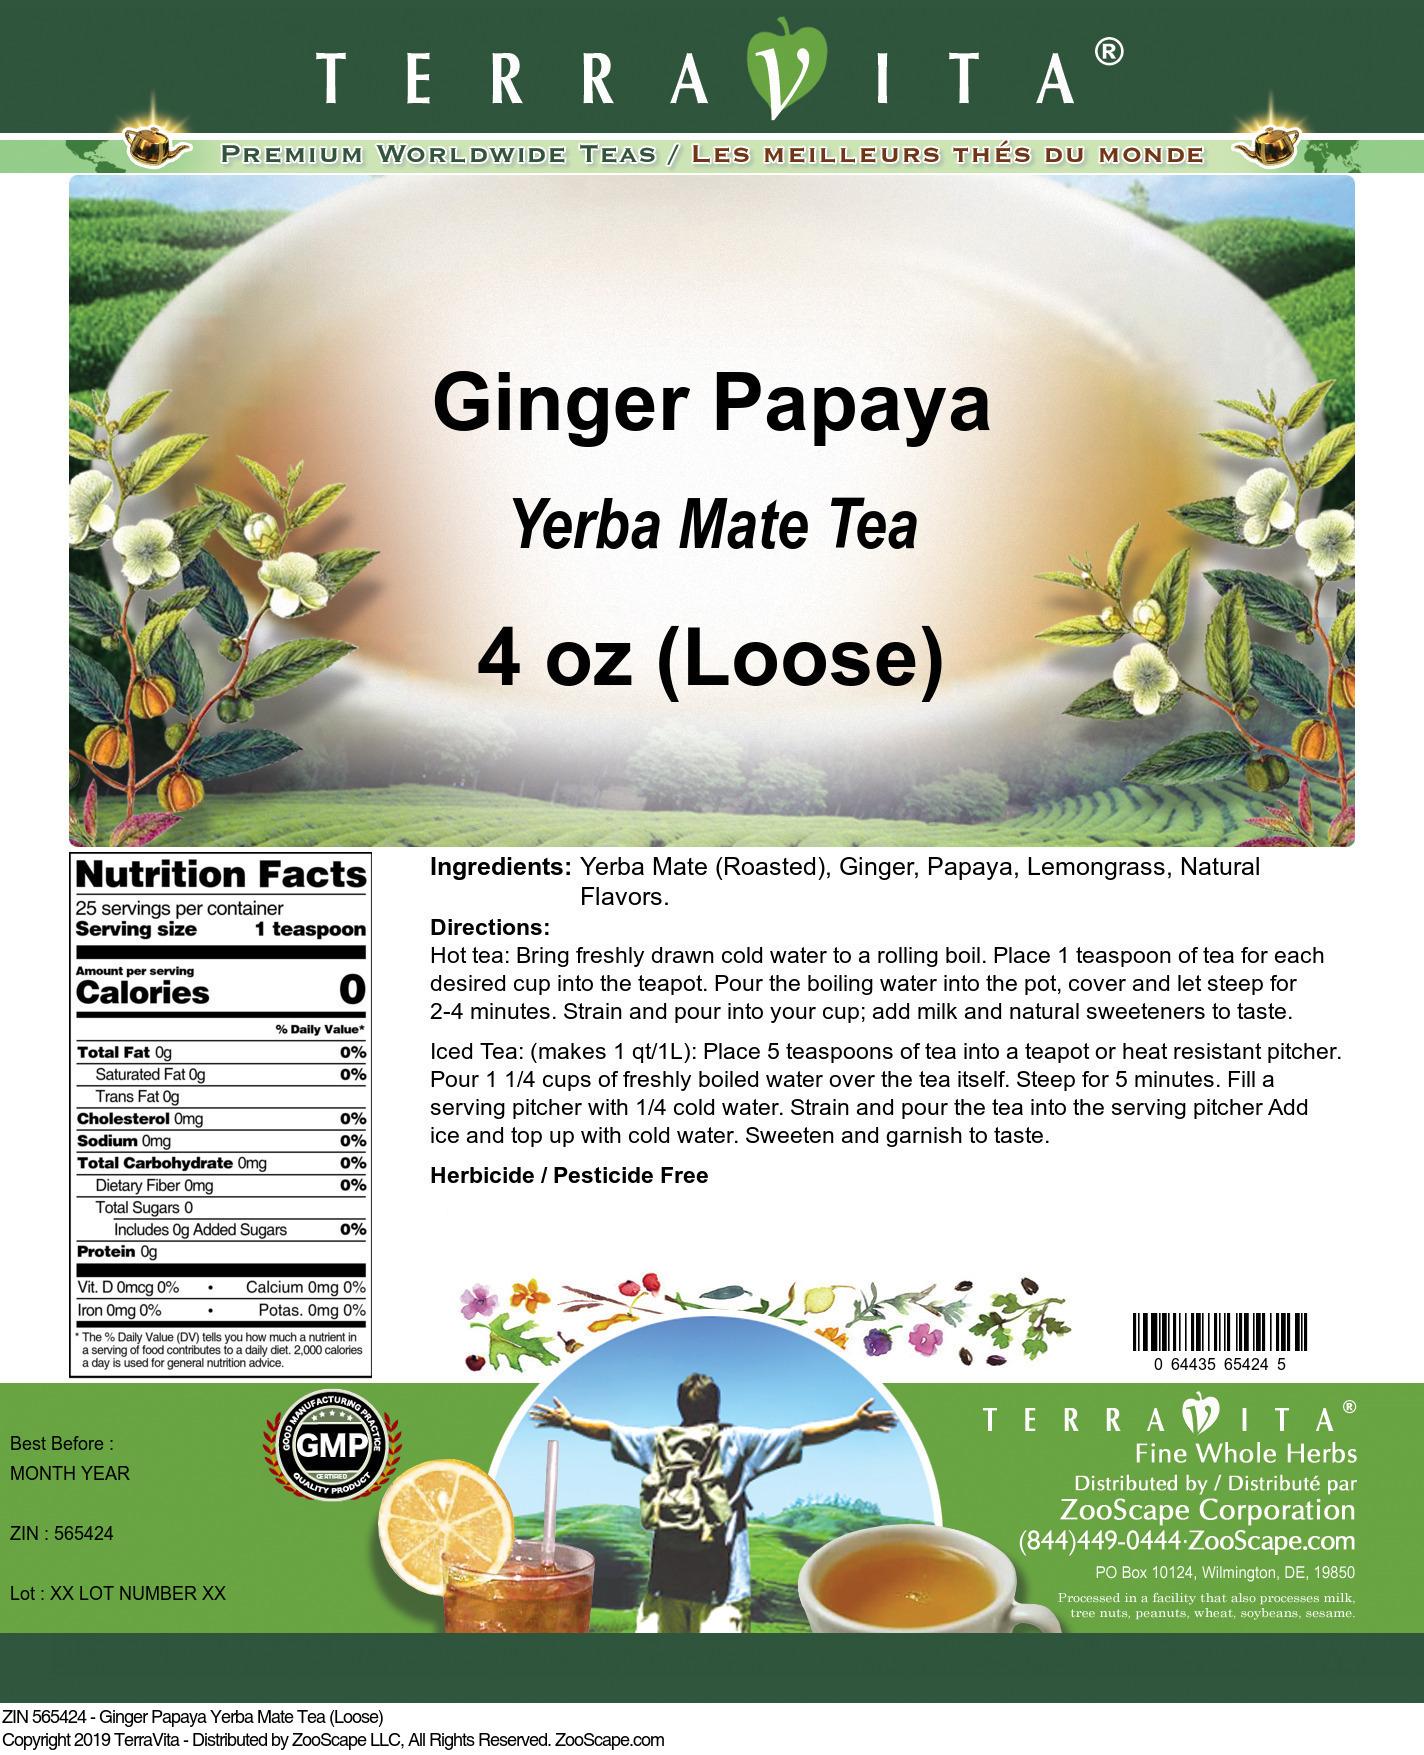 Ginger Papaya Yerba Mate Tea (Loose)